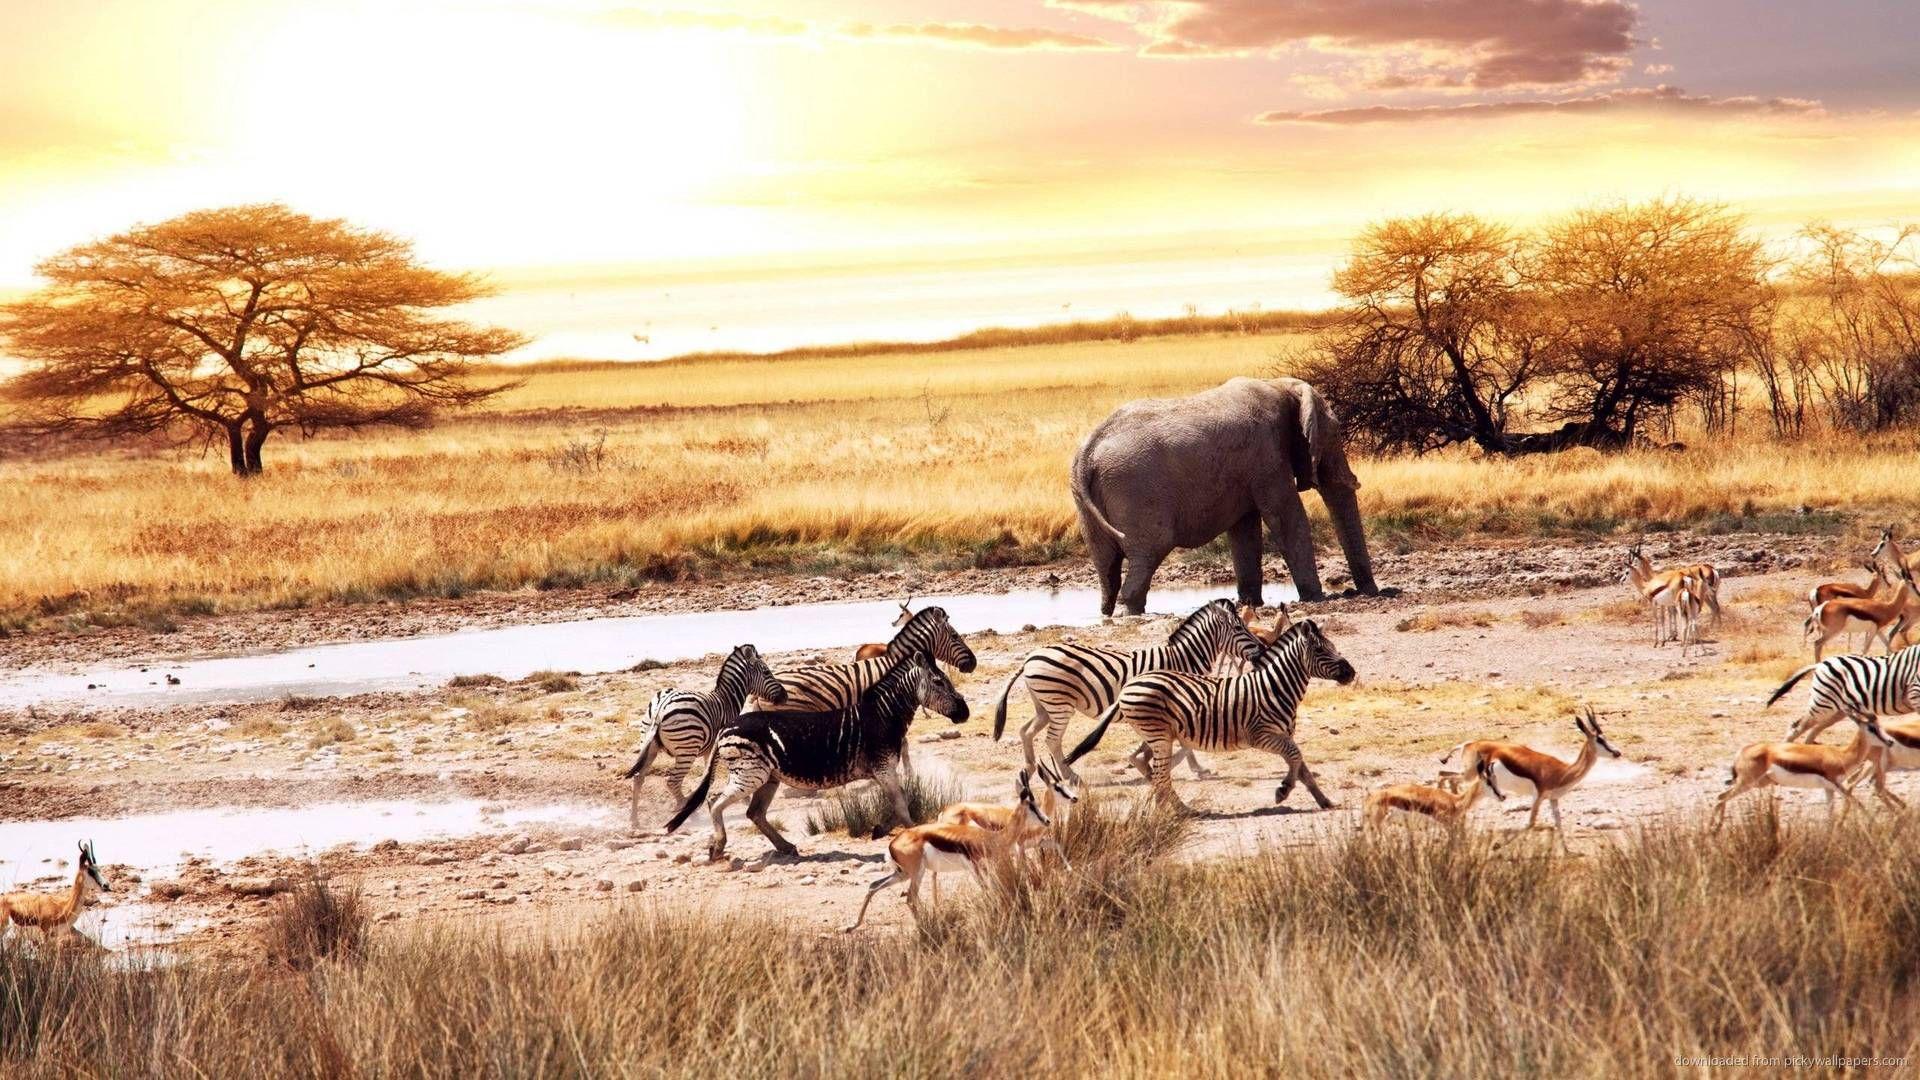 The Animals Of The Savannah